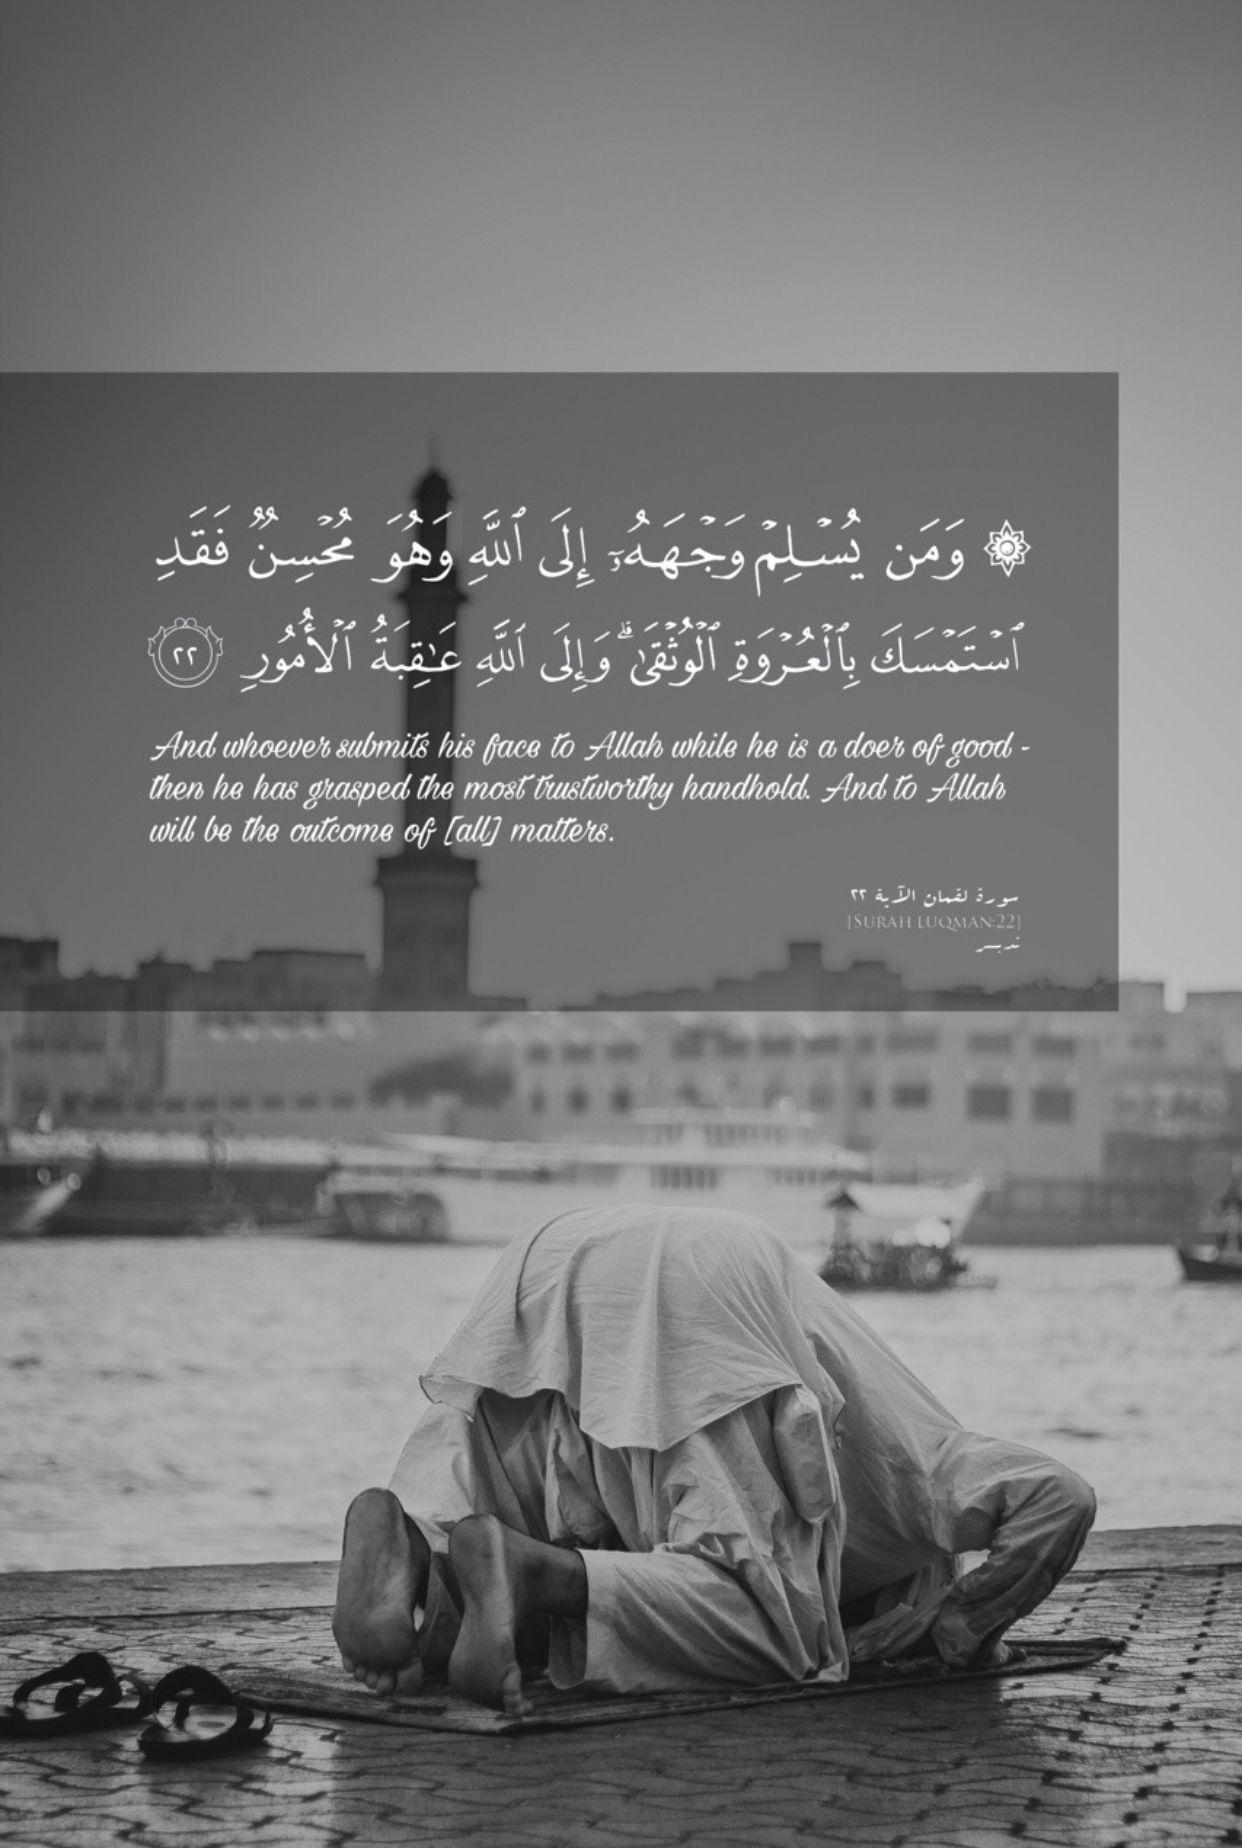 Citaten Filosofie Quran : Pin van m. op quran quotes.